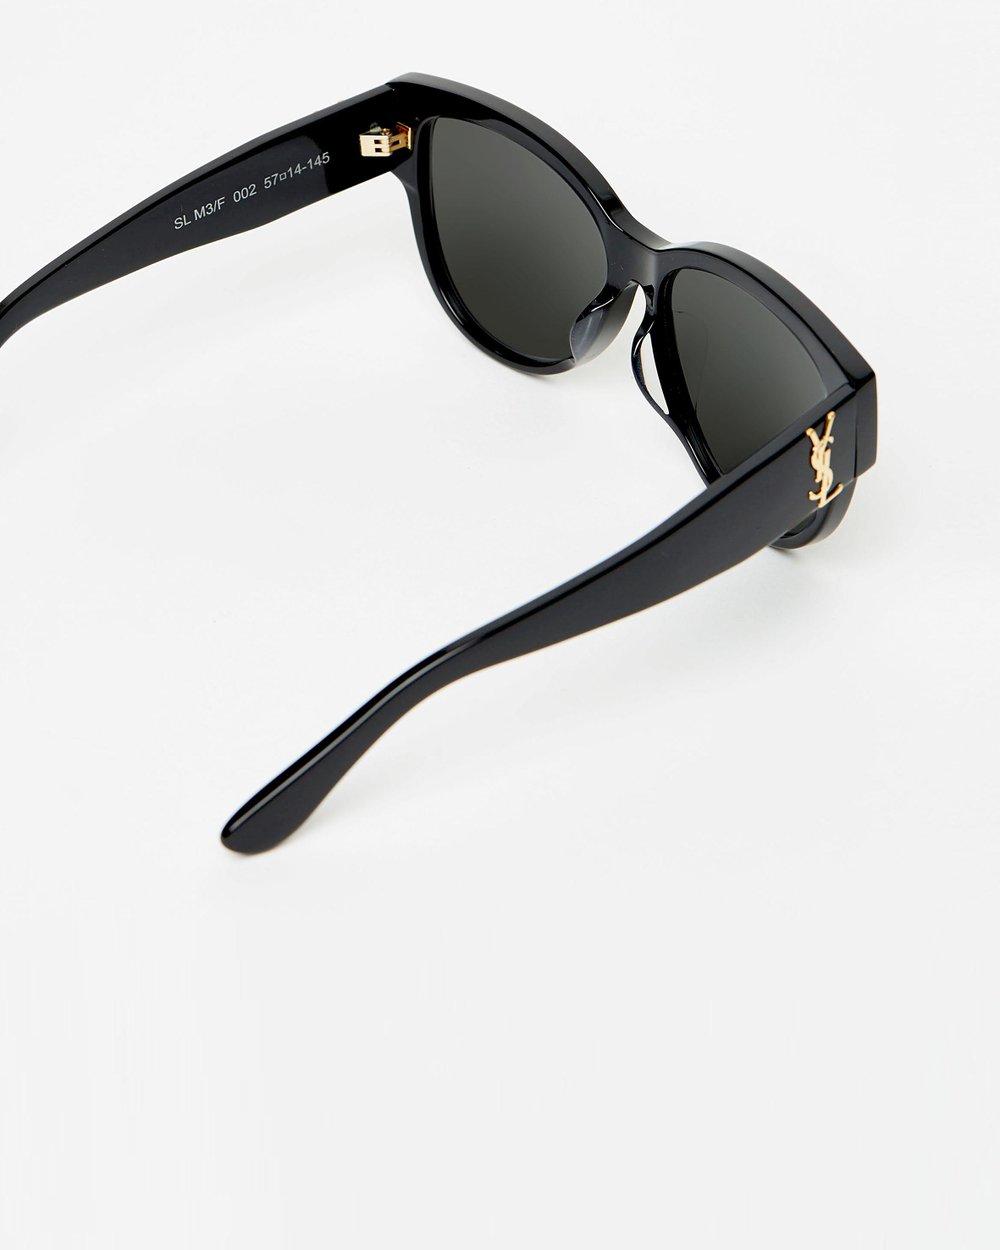 ec0fc332eeb SL M3 Cat Eye Sunglasses by Saint Laurent Online